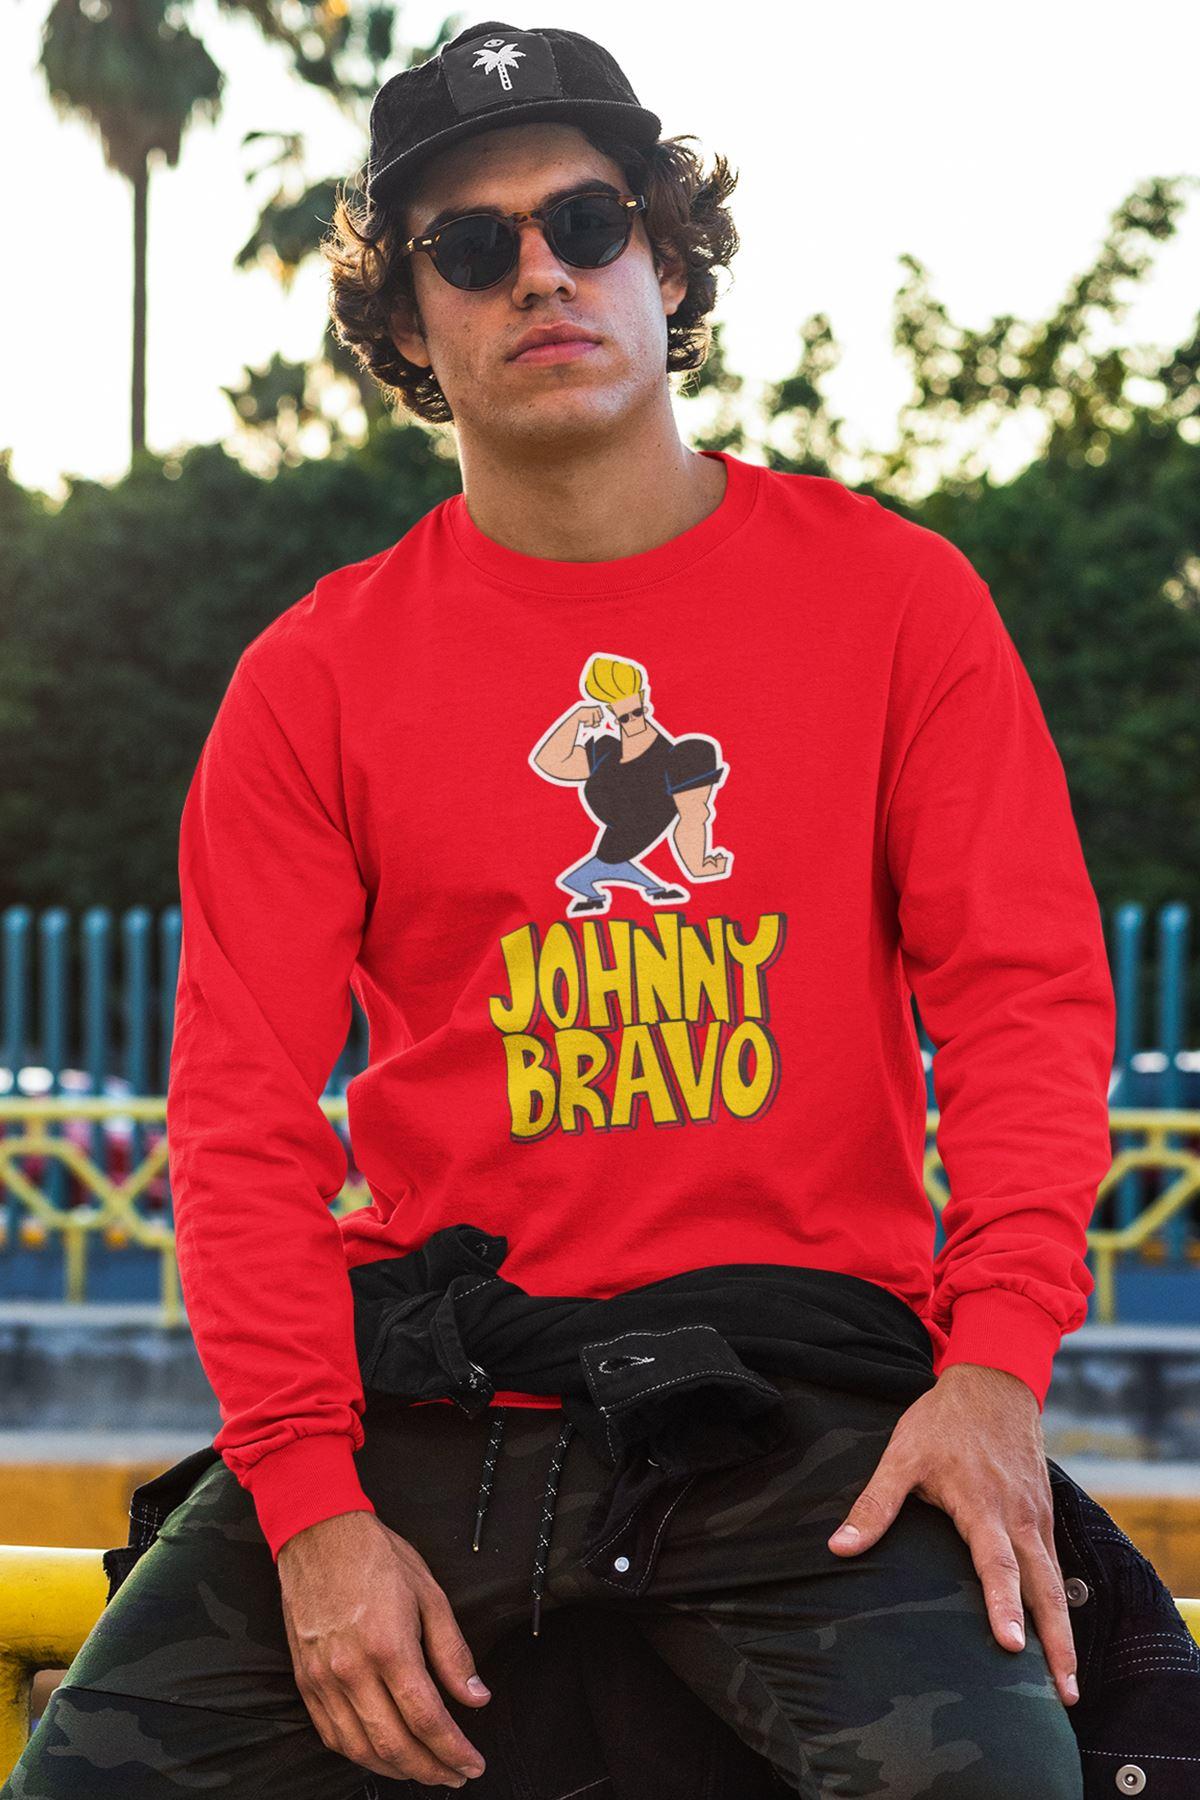 Johnny Bravo 220 Kırmızı Sweatshirt